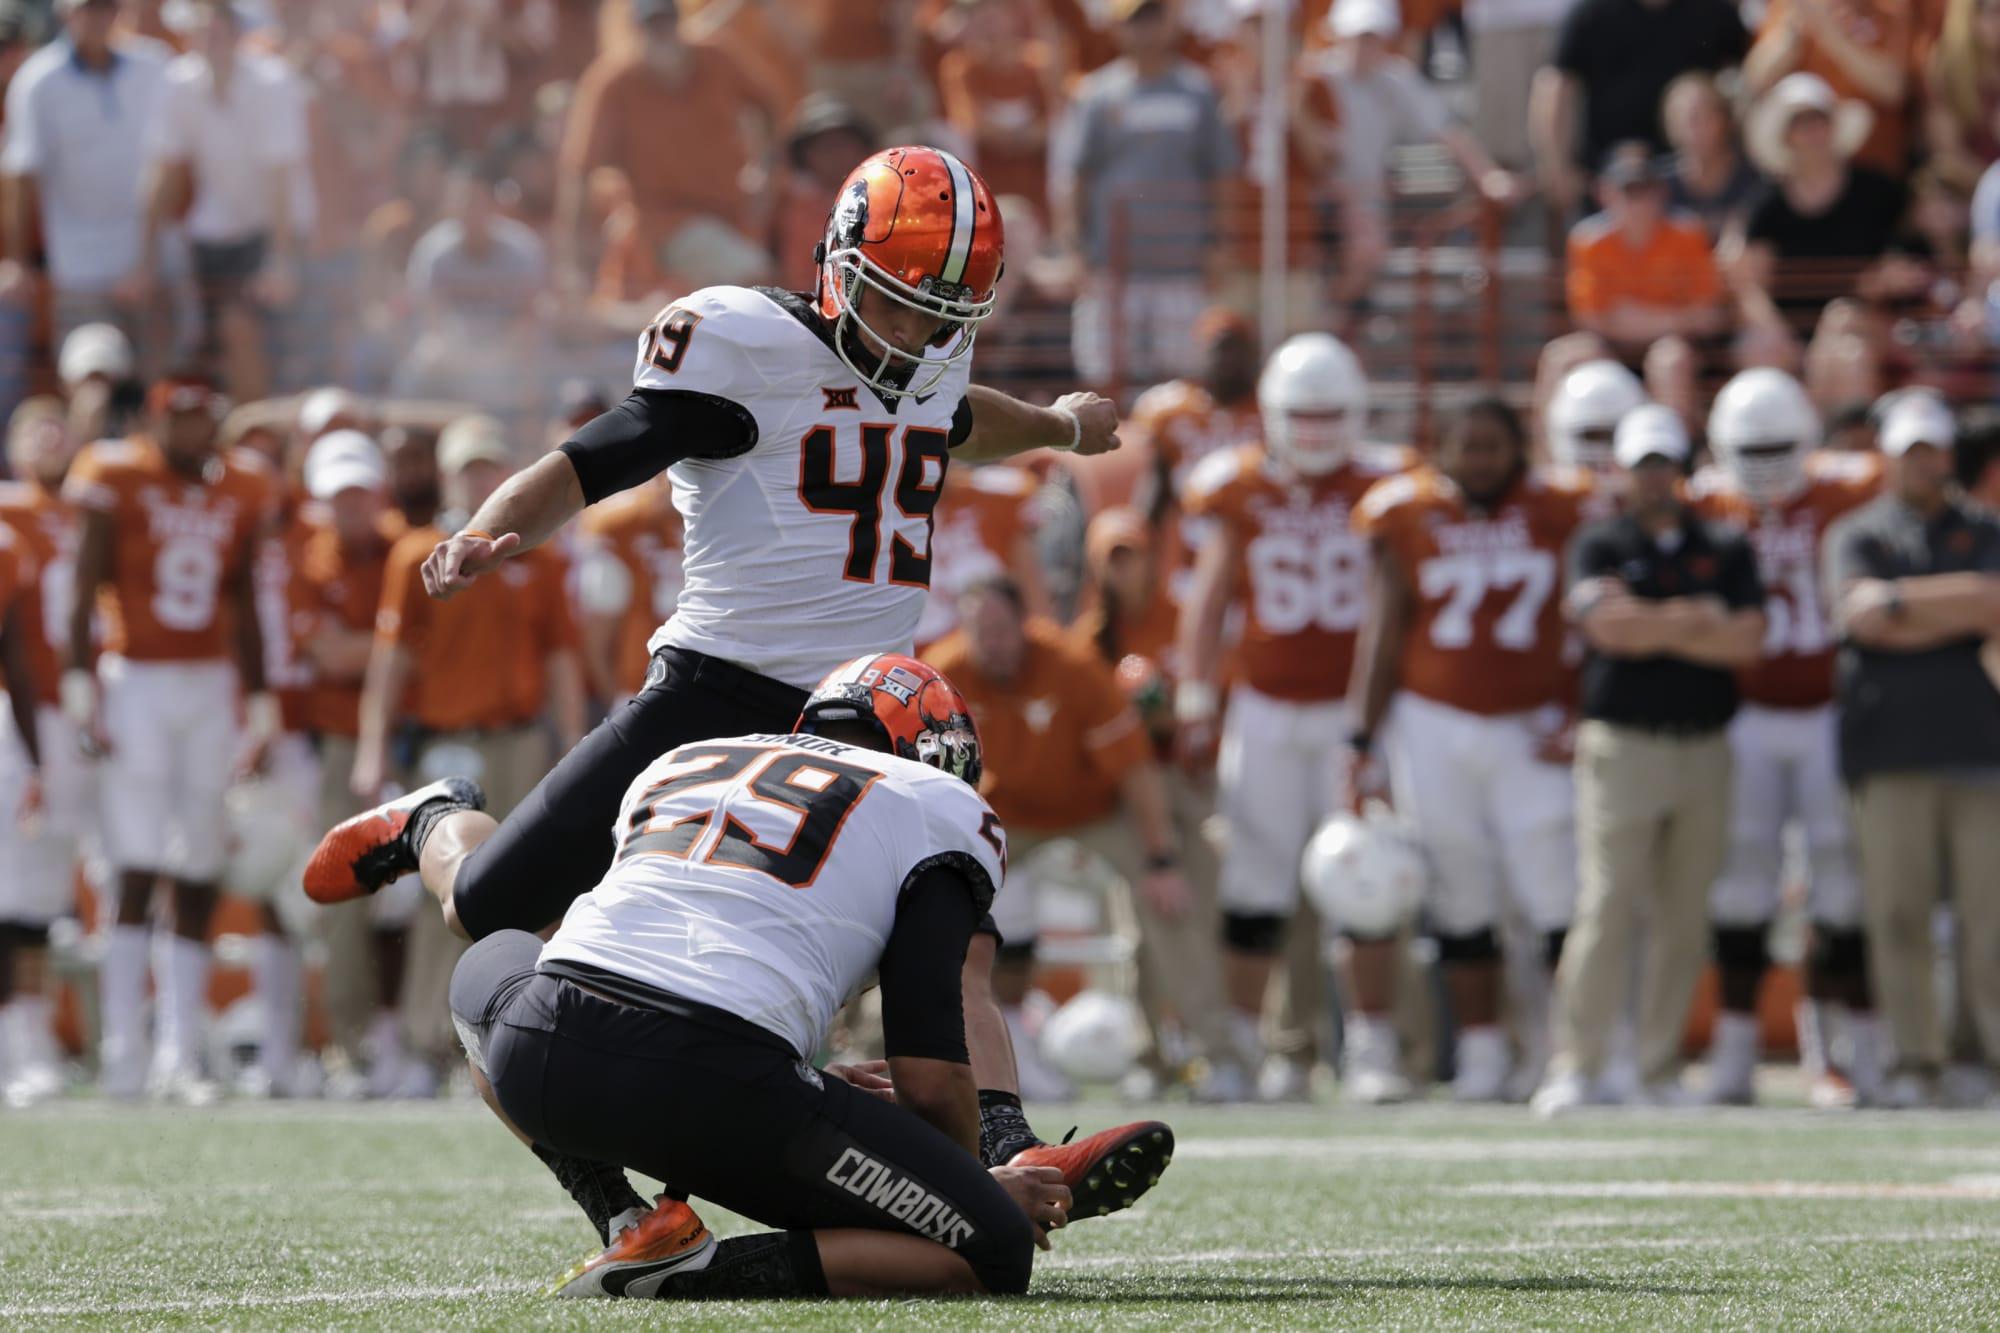 Texas Football: Field goal margins decide OK State wins ...